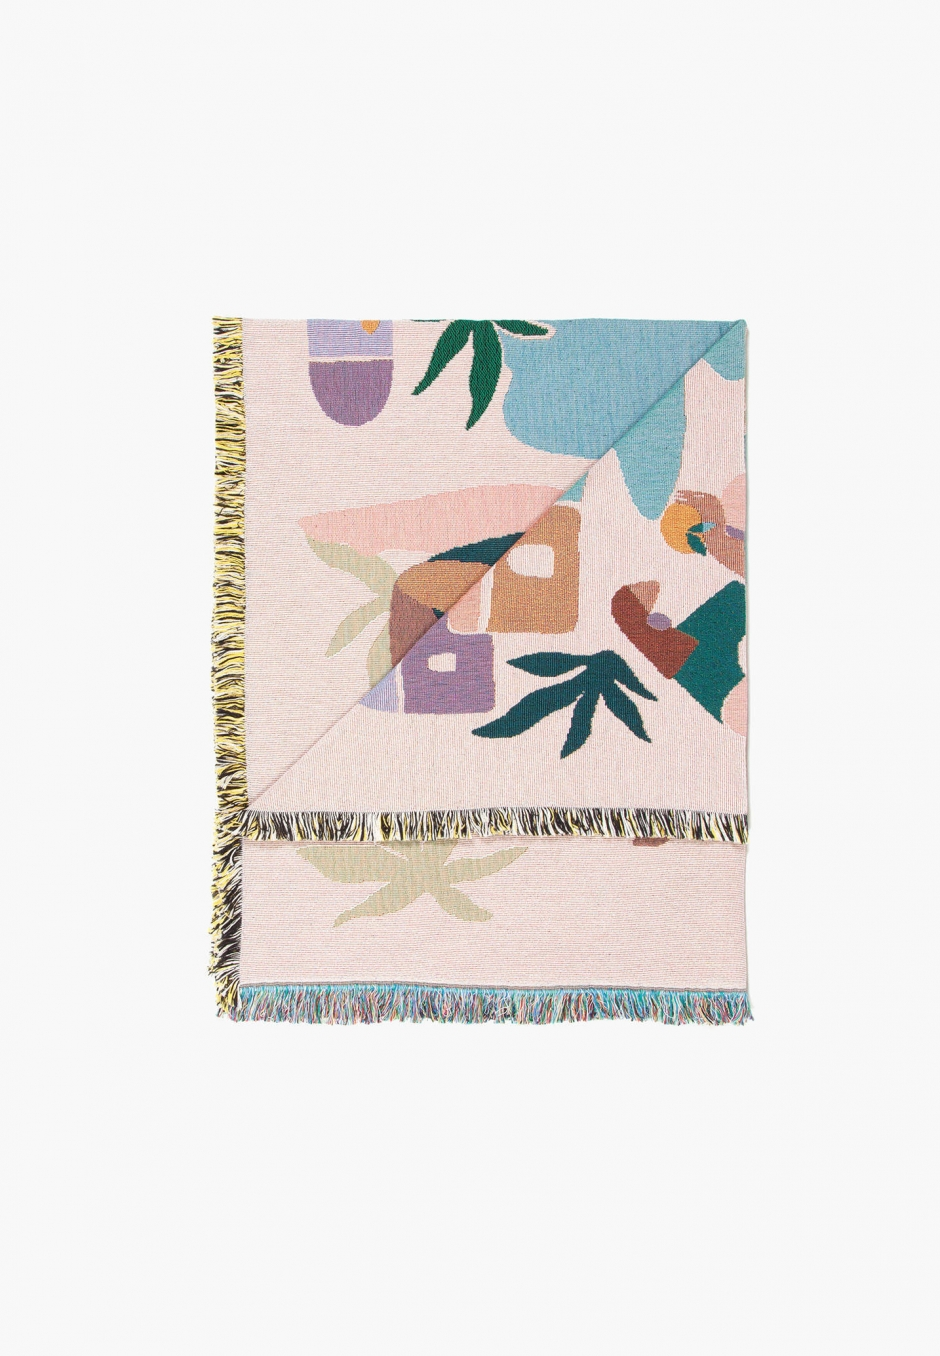 Slowdown Studio Ayers Throw - Maggie Stephenson